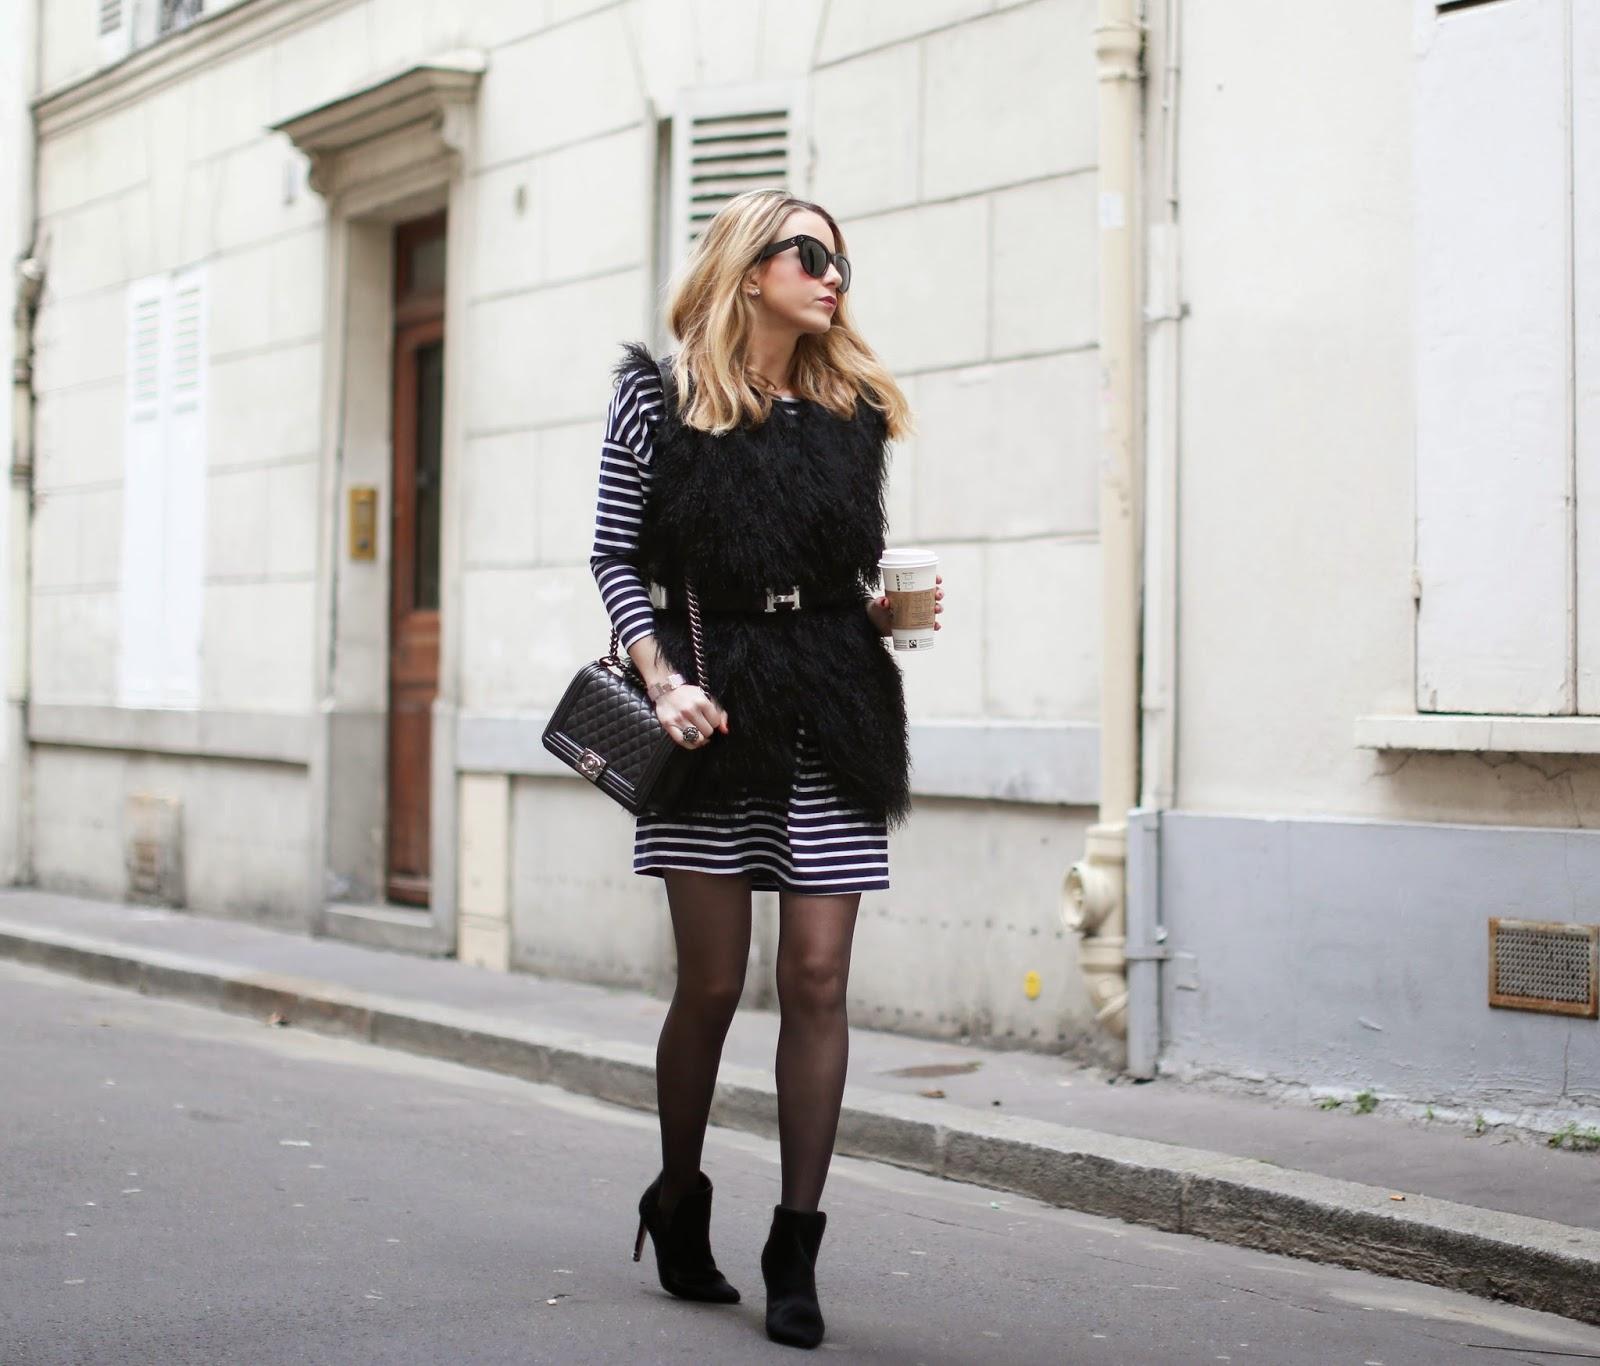 stripes, fur, bohemian traders, zadig et voltaire, zara, chanel, hermes, fashion blogger, streetstyle